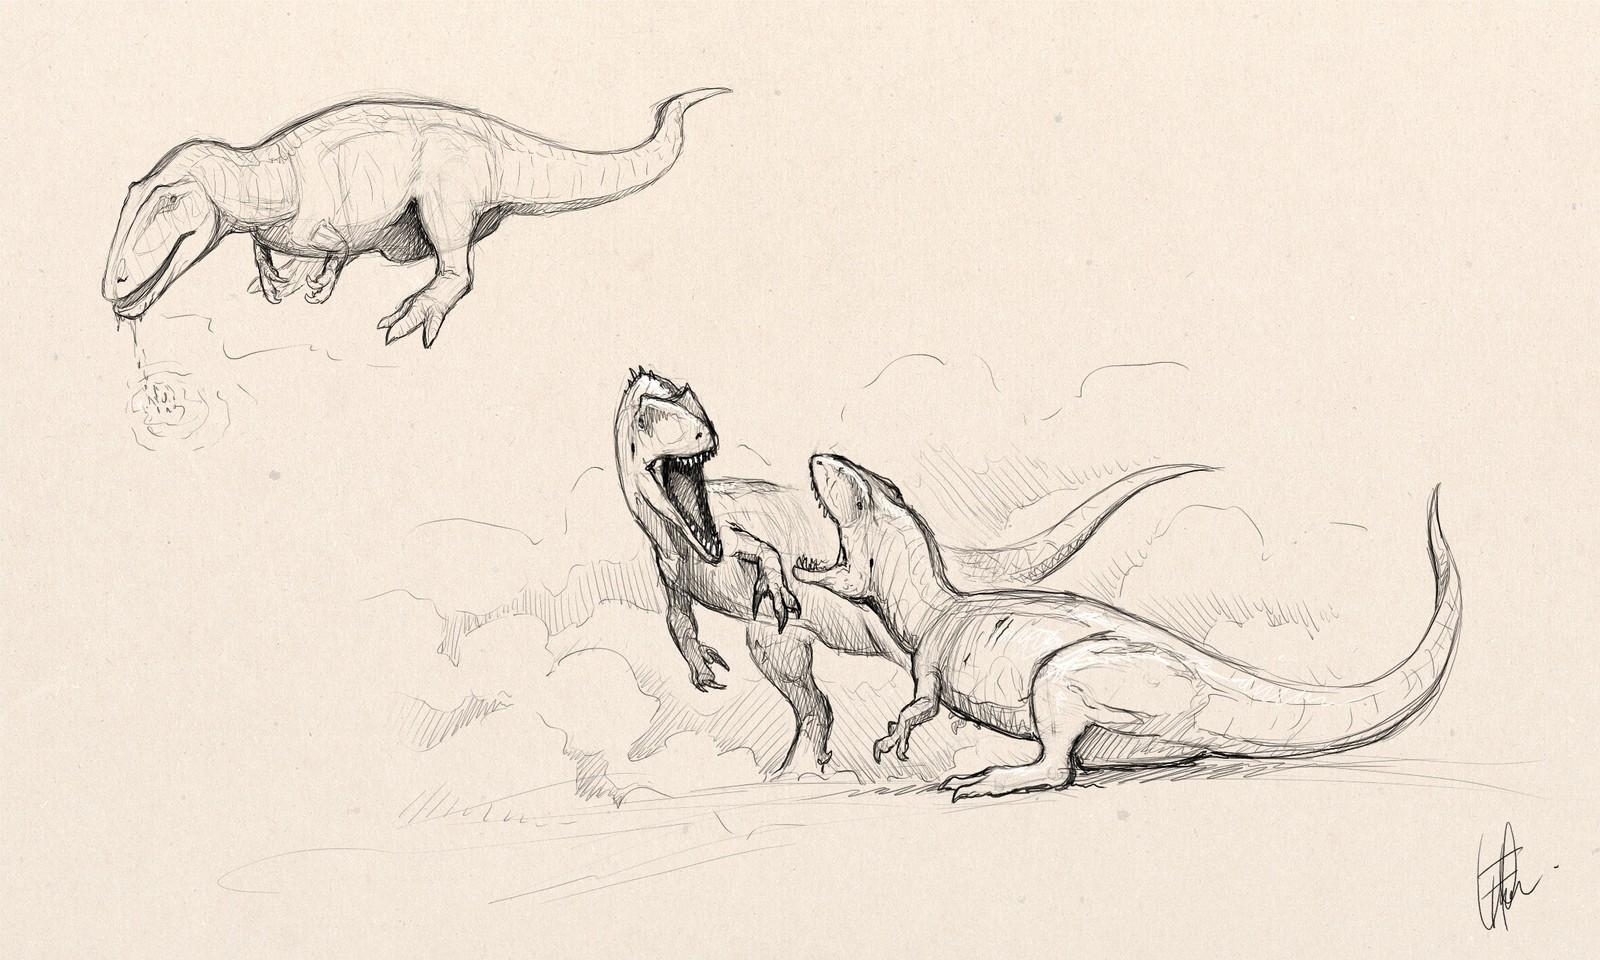 Carcharodontosaurus studies